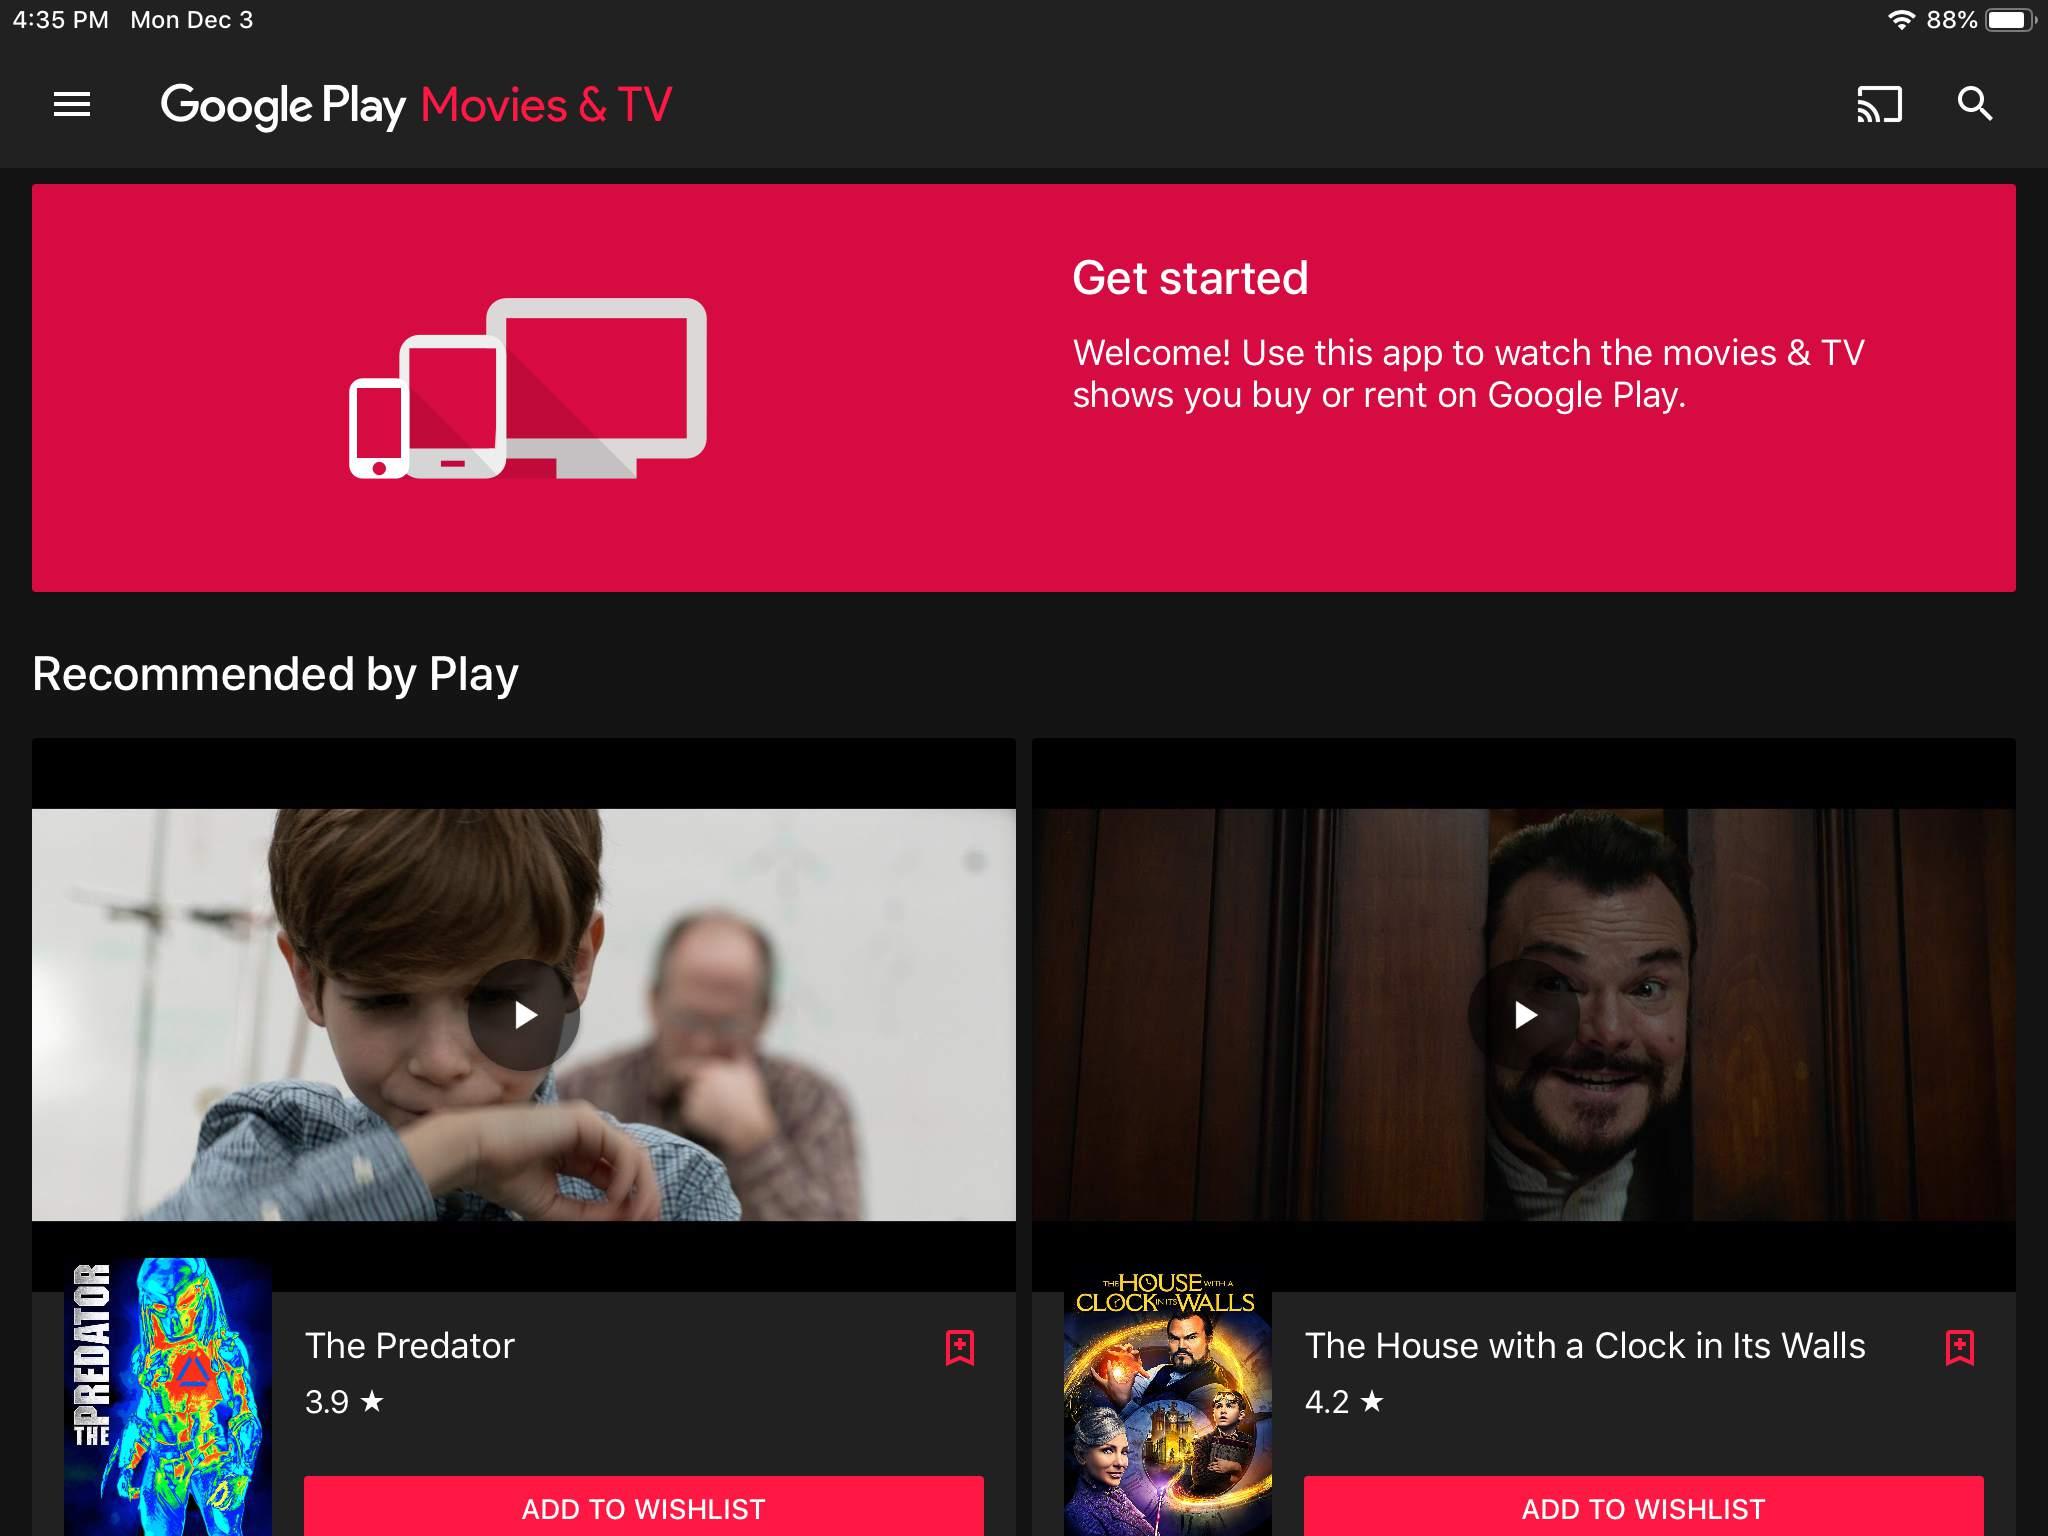 Google Play Movies & TV app on iPad